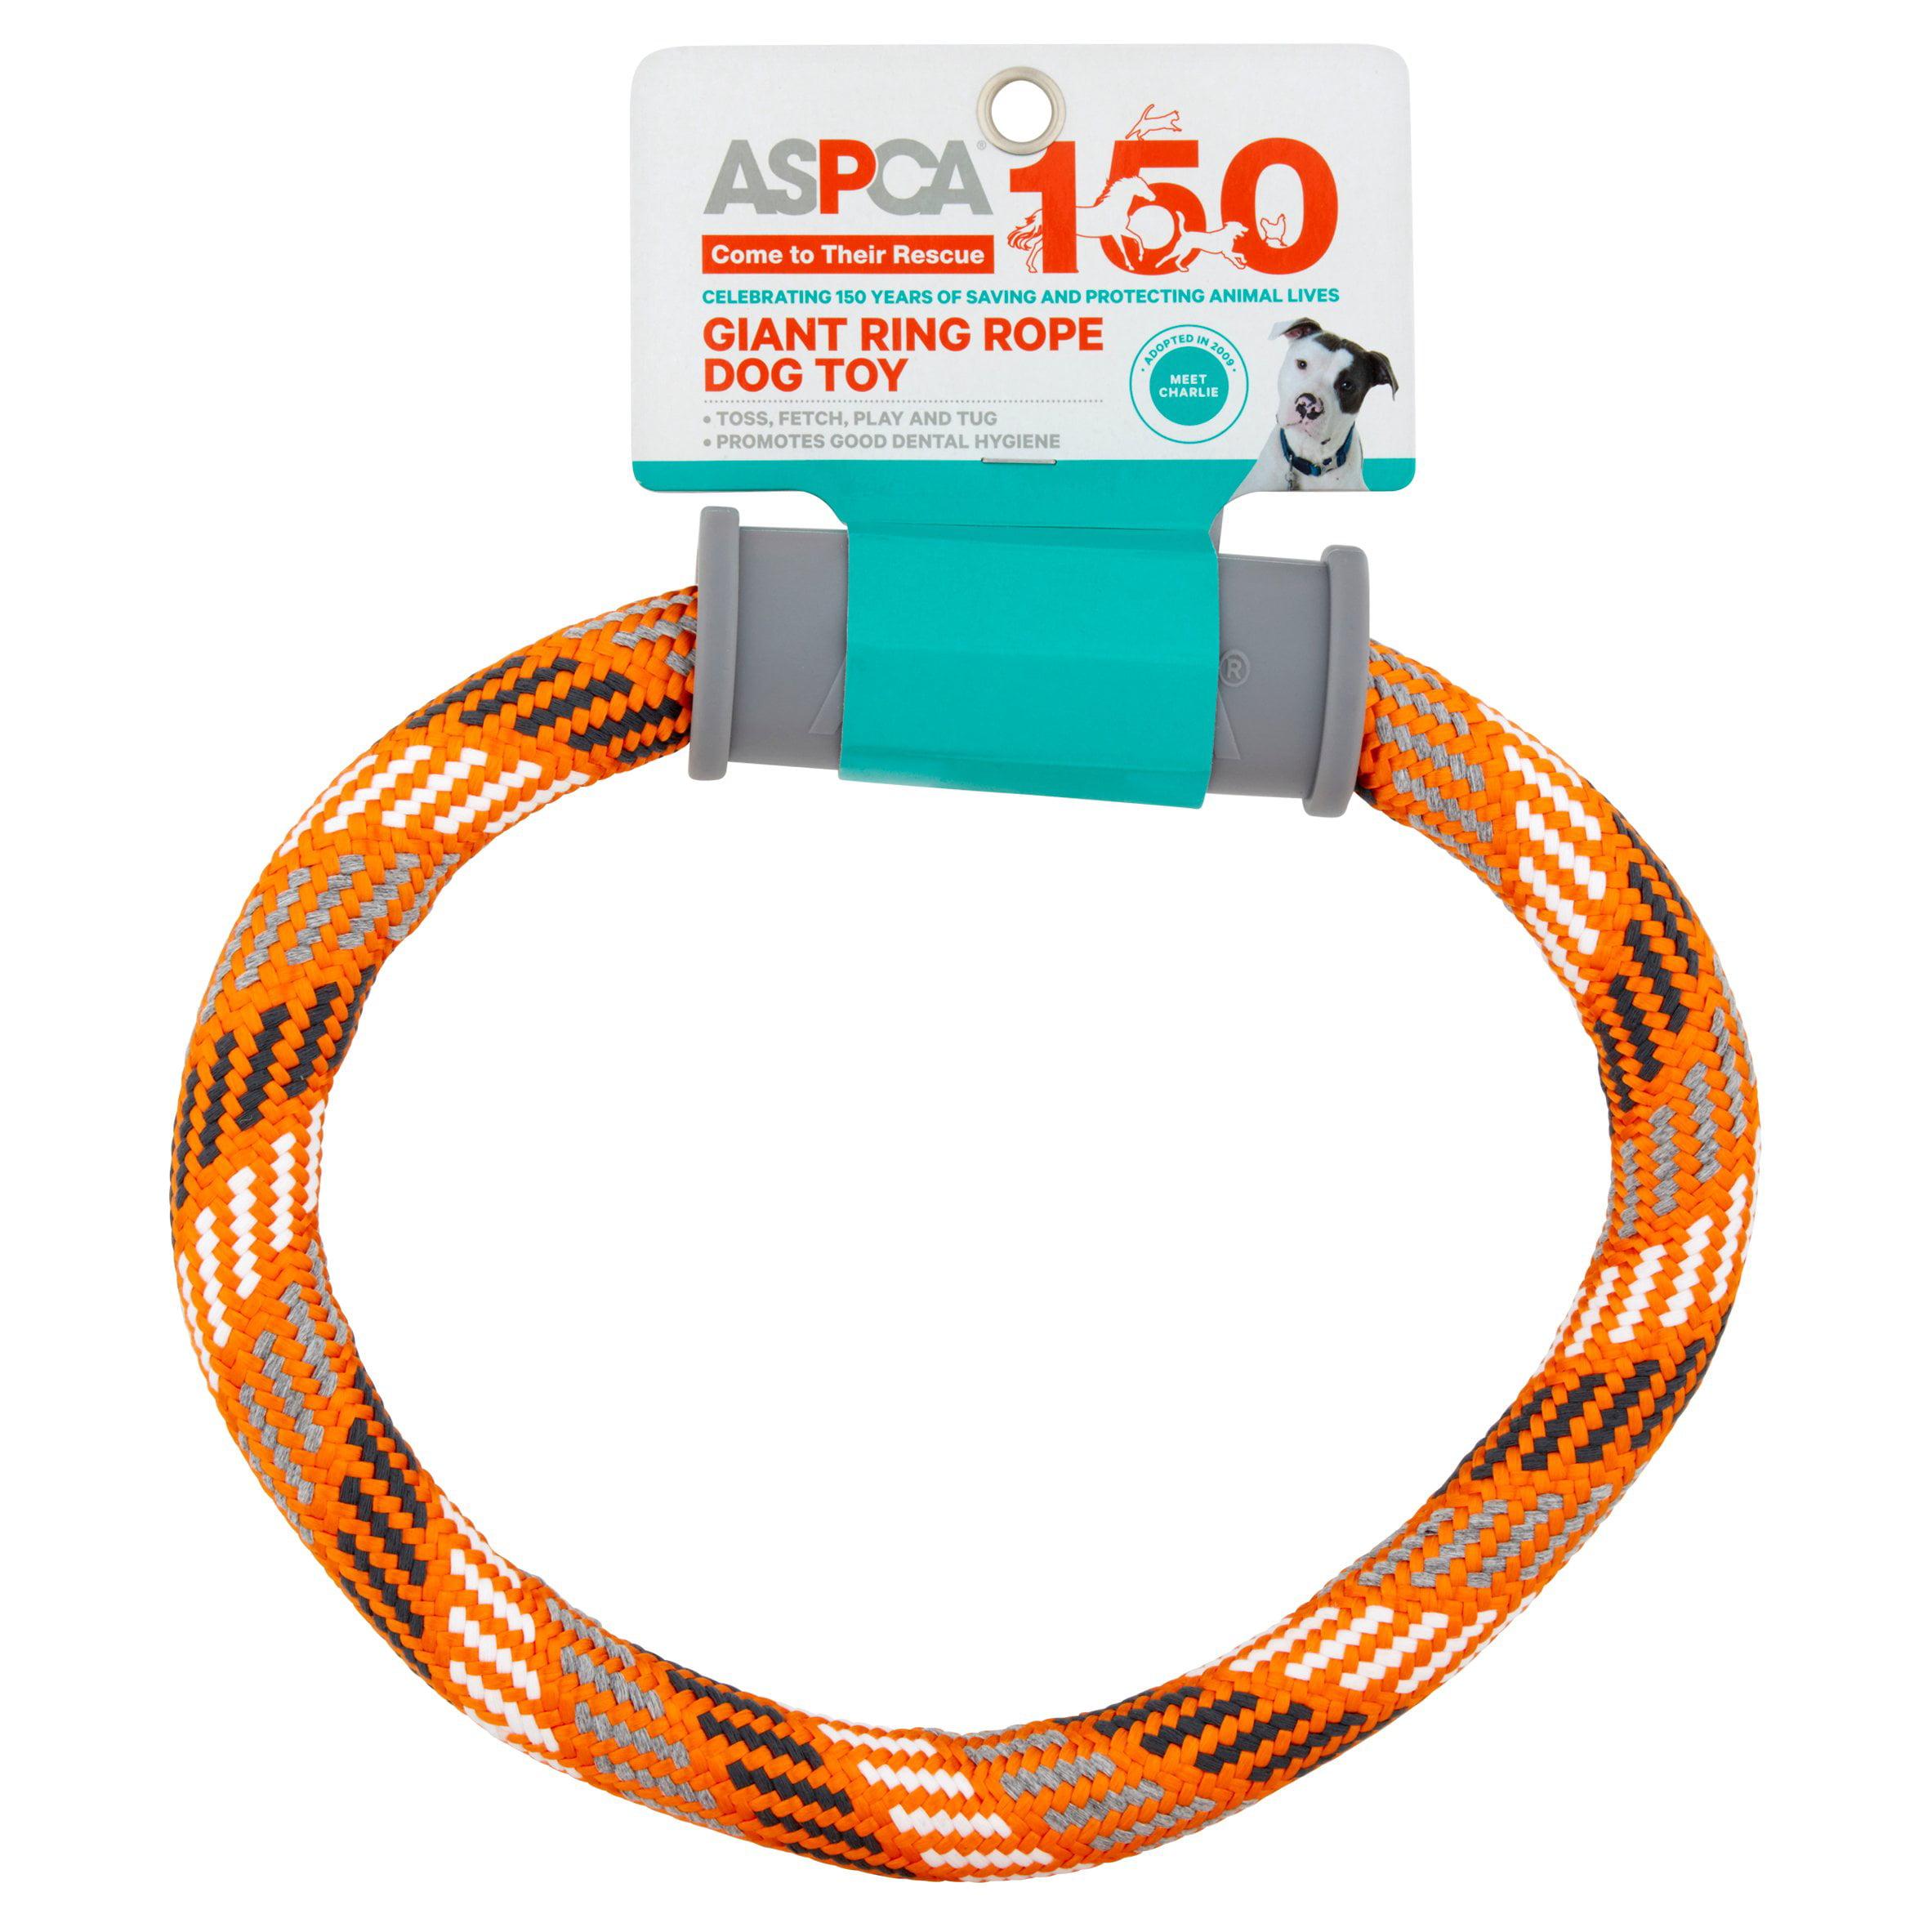 ASPCA Giant Ring Blue Rope Dog Toy